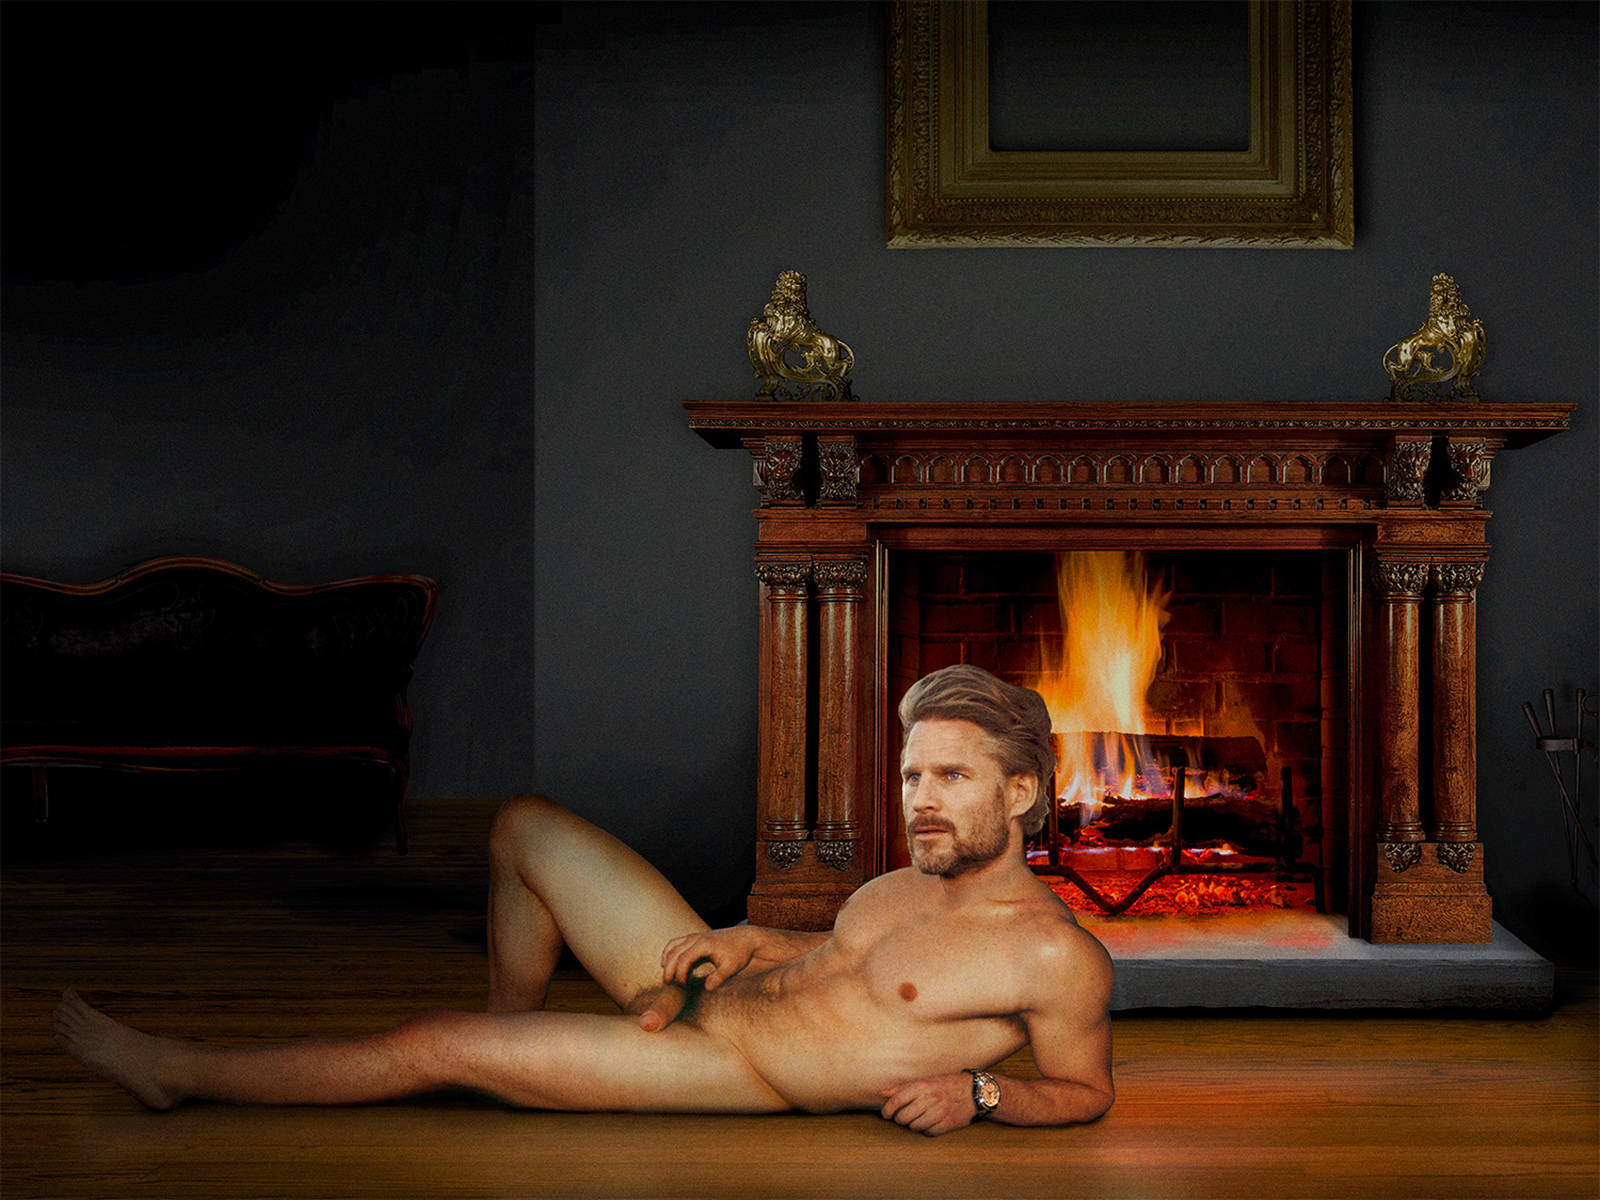 Fireplace, 2014